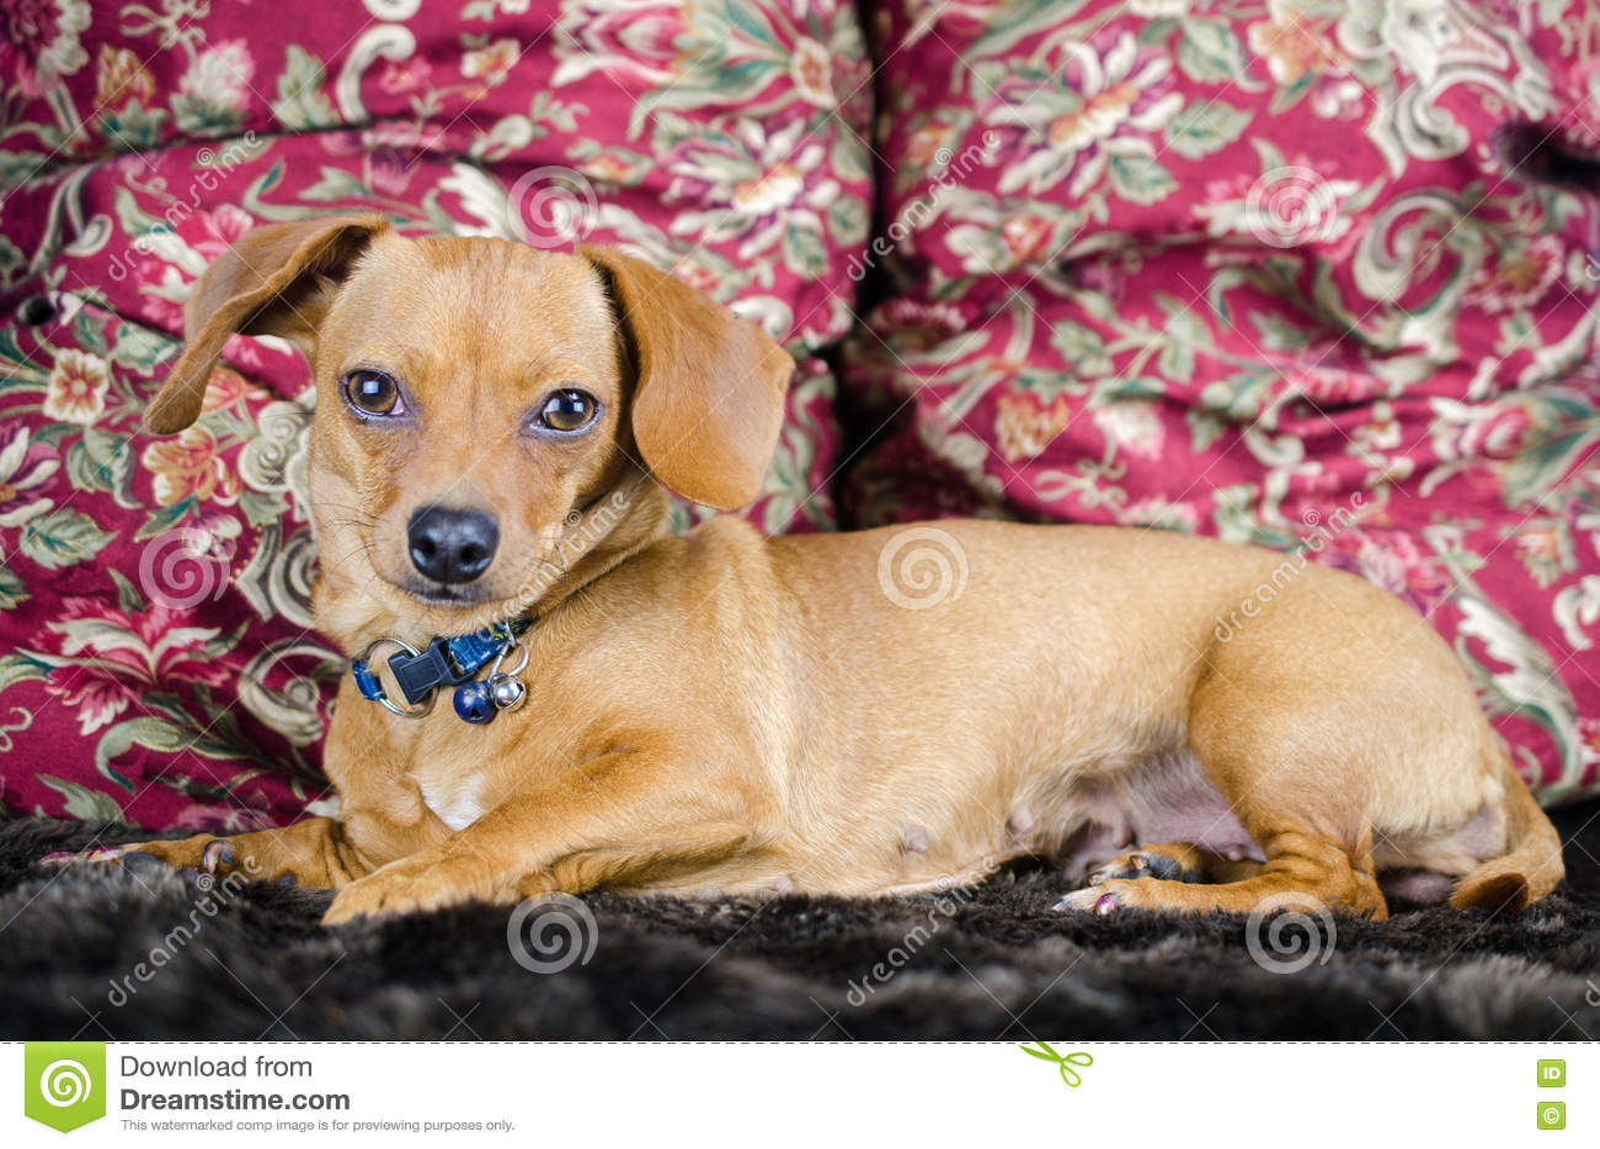 Dachshund Chihuahua Chiweenie Adoption Portrait Stock Image